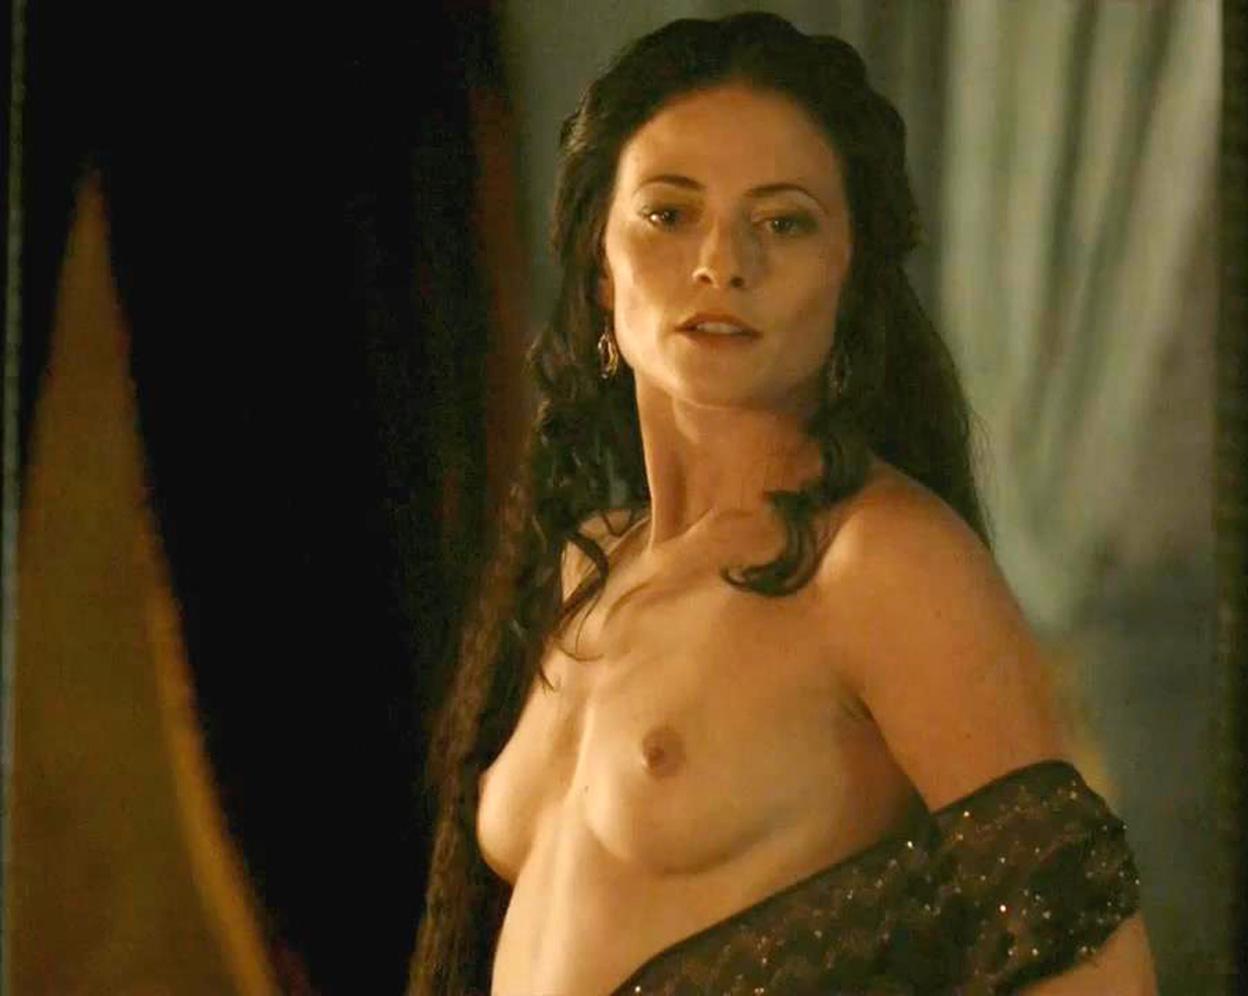 Holy shit natalie dormer naked collection leaks revealed celebrity revealer